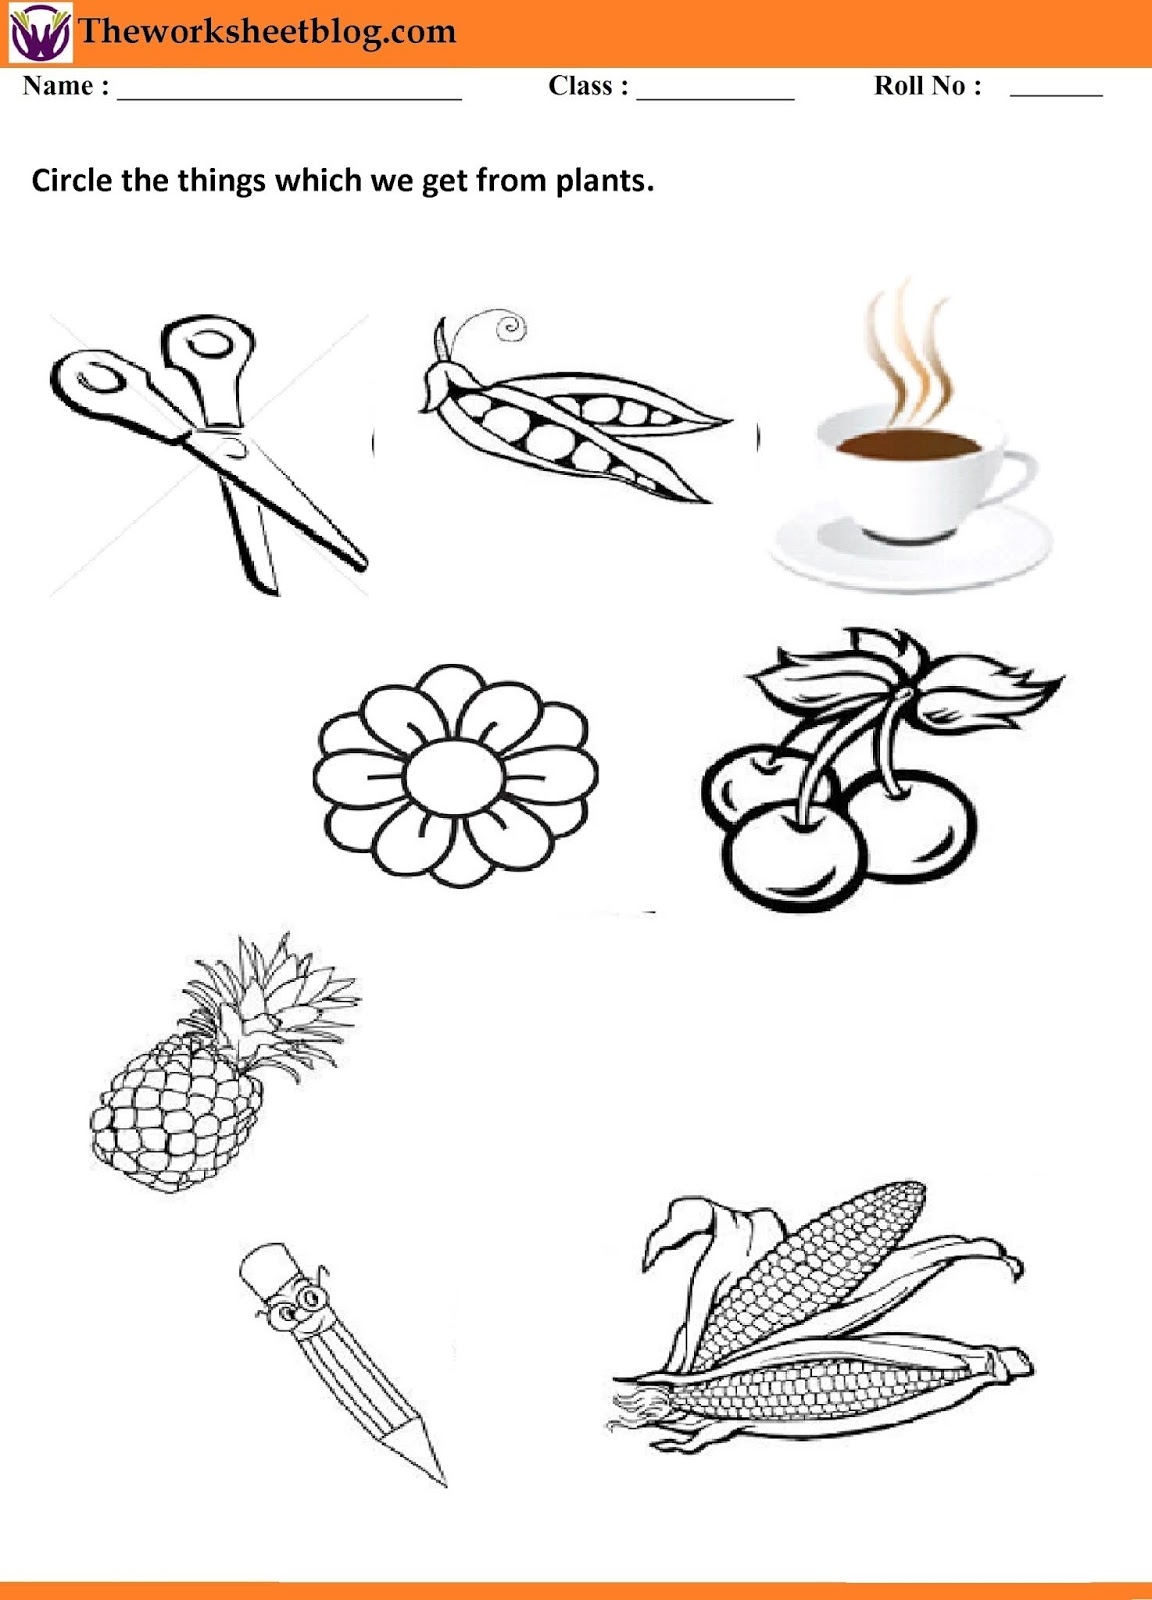 medium resolution of Plants around us worksheets - Theworksheetsblog